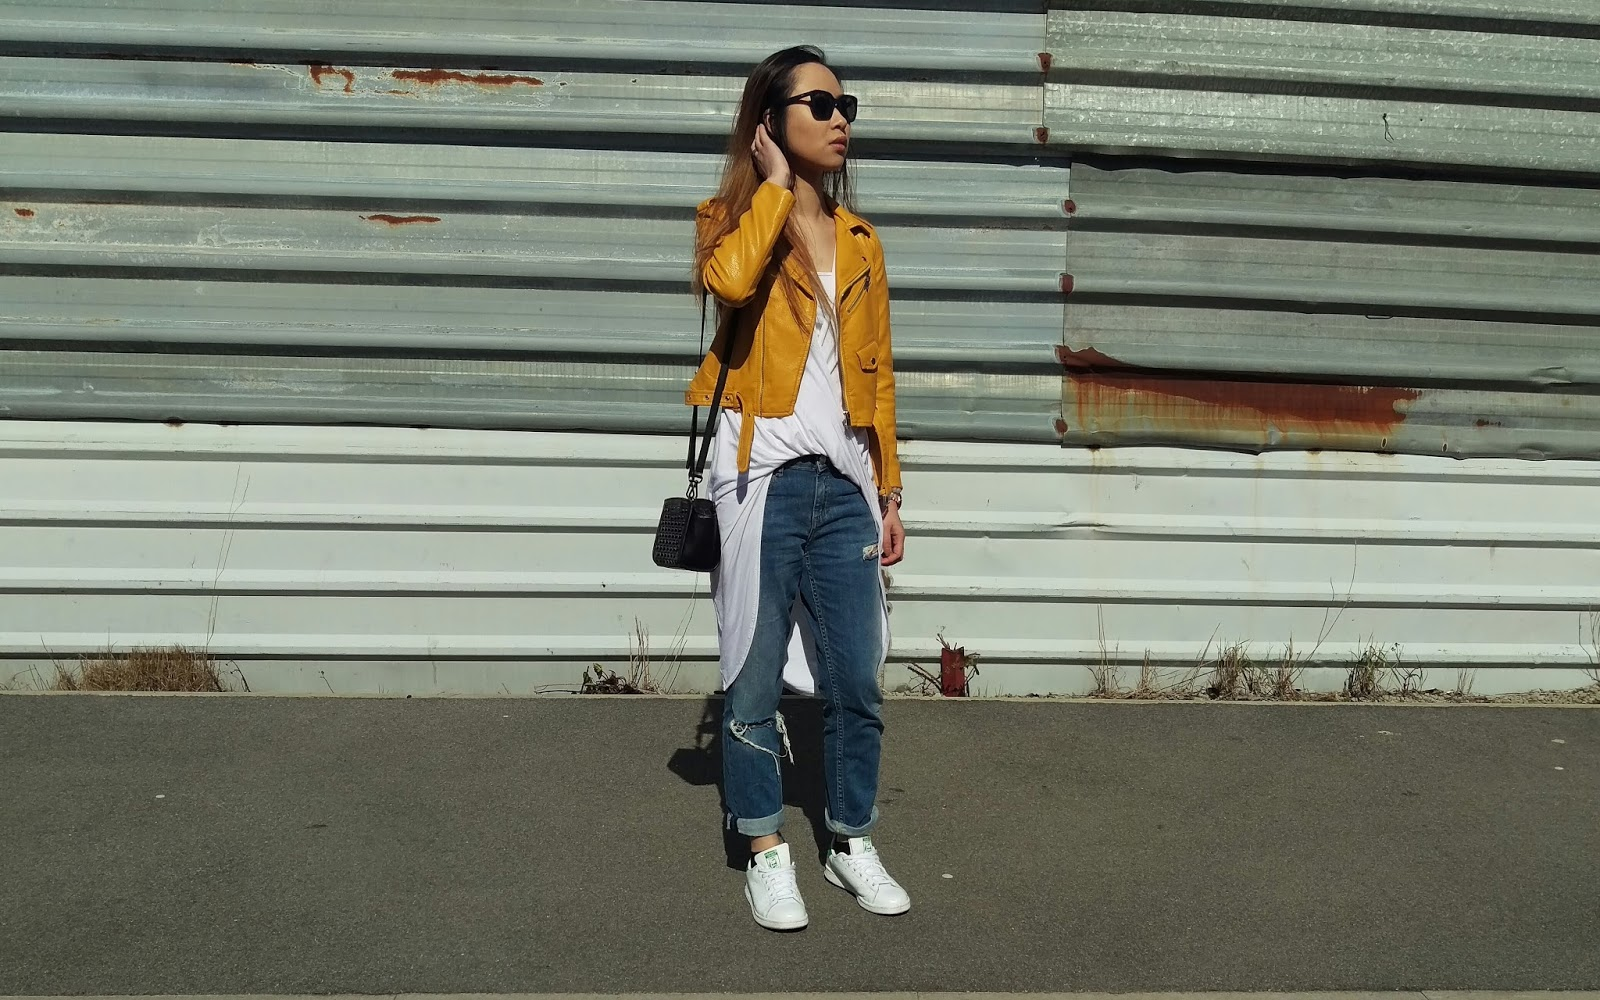 Leather jacket yellow zara - Zara Jacket Missguided Wrap Top Asos Jeans Adidas Stan Smith Quay Australia Sunglasses